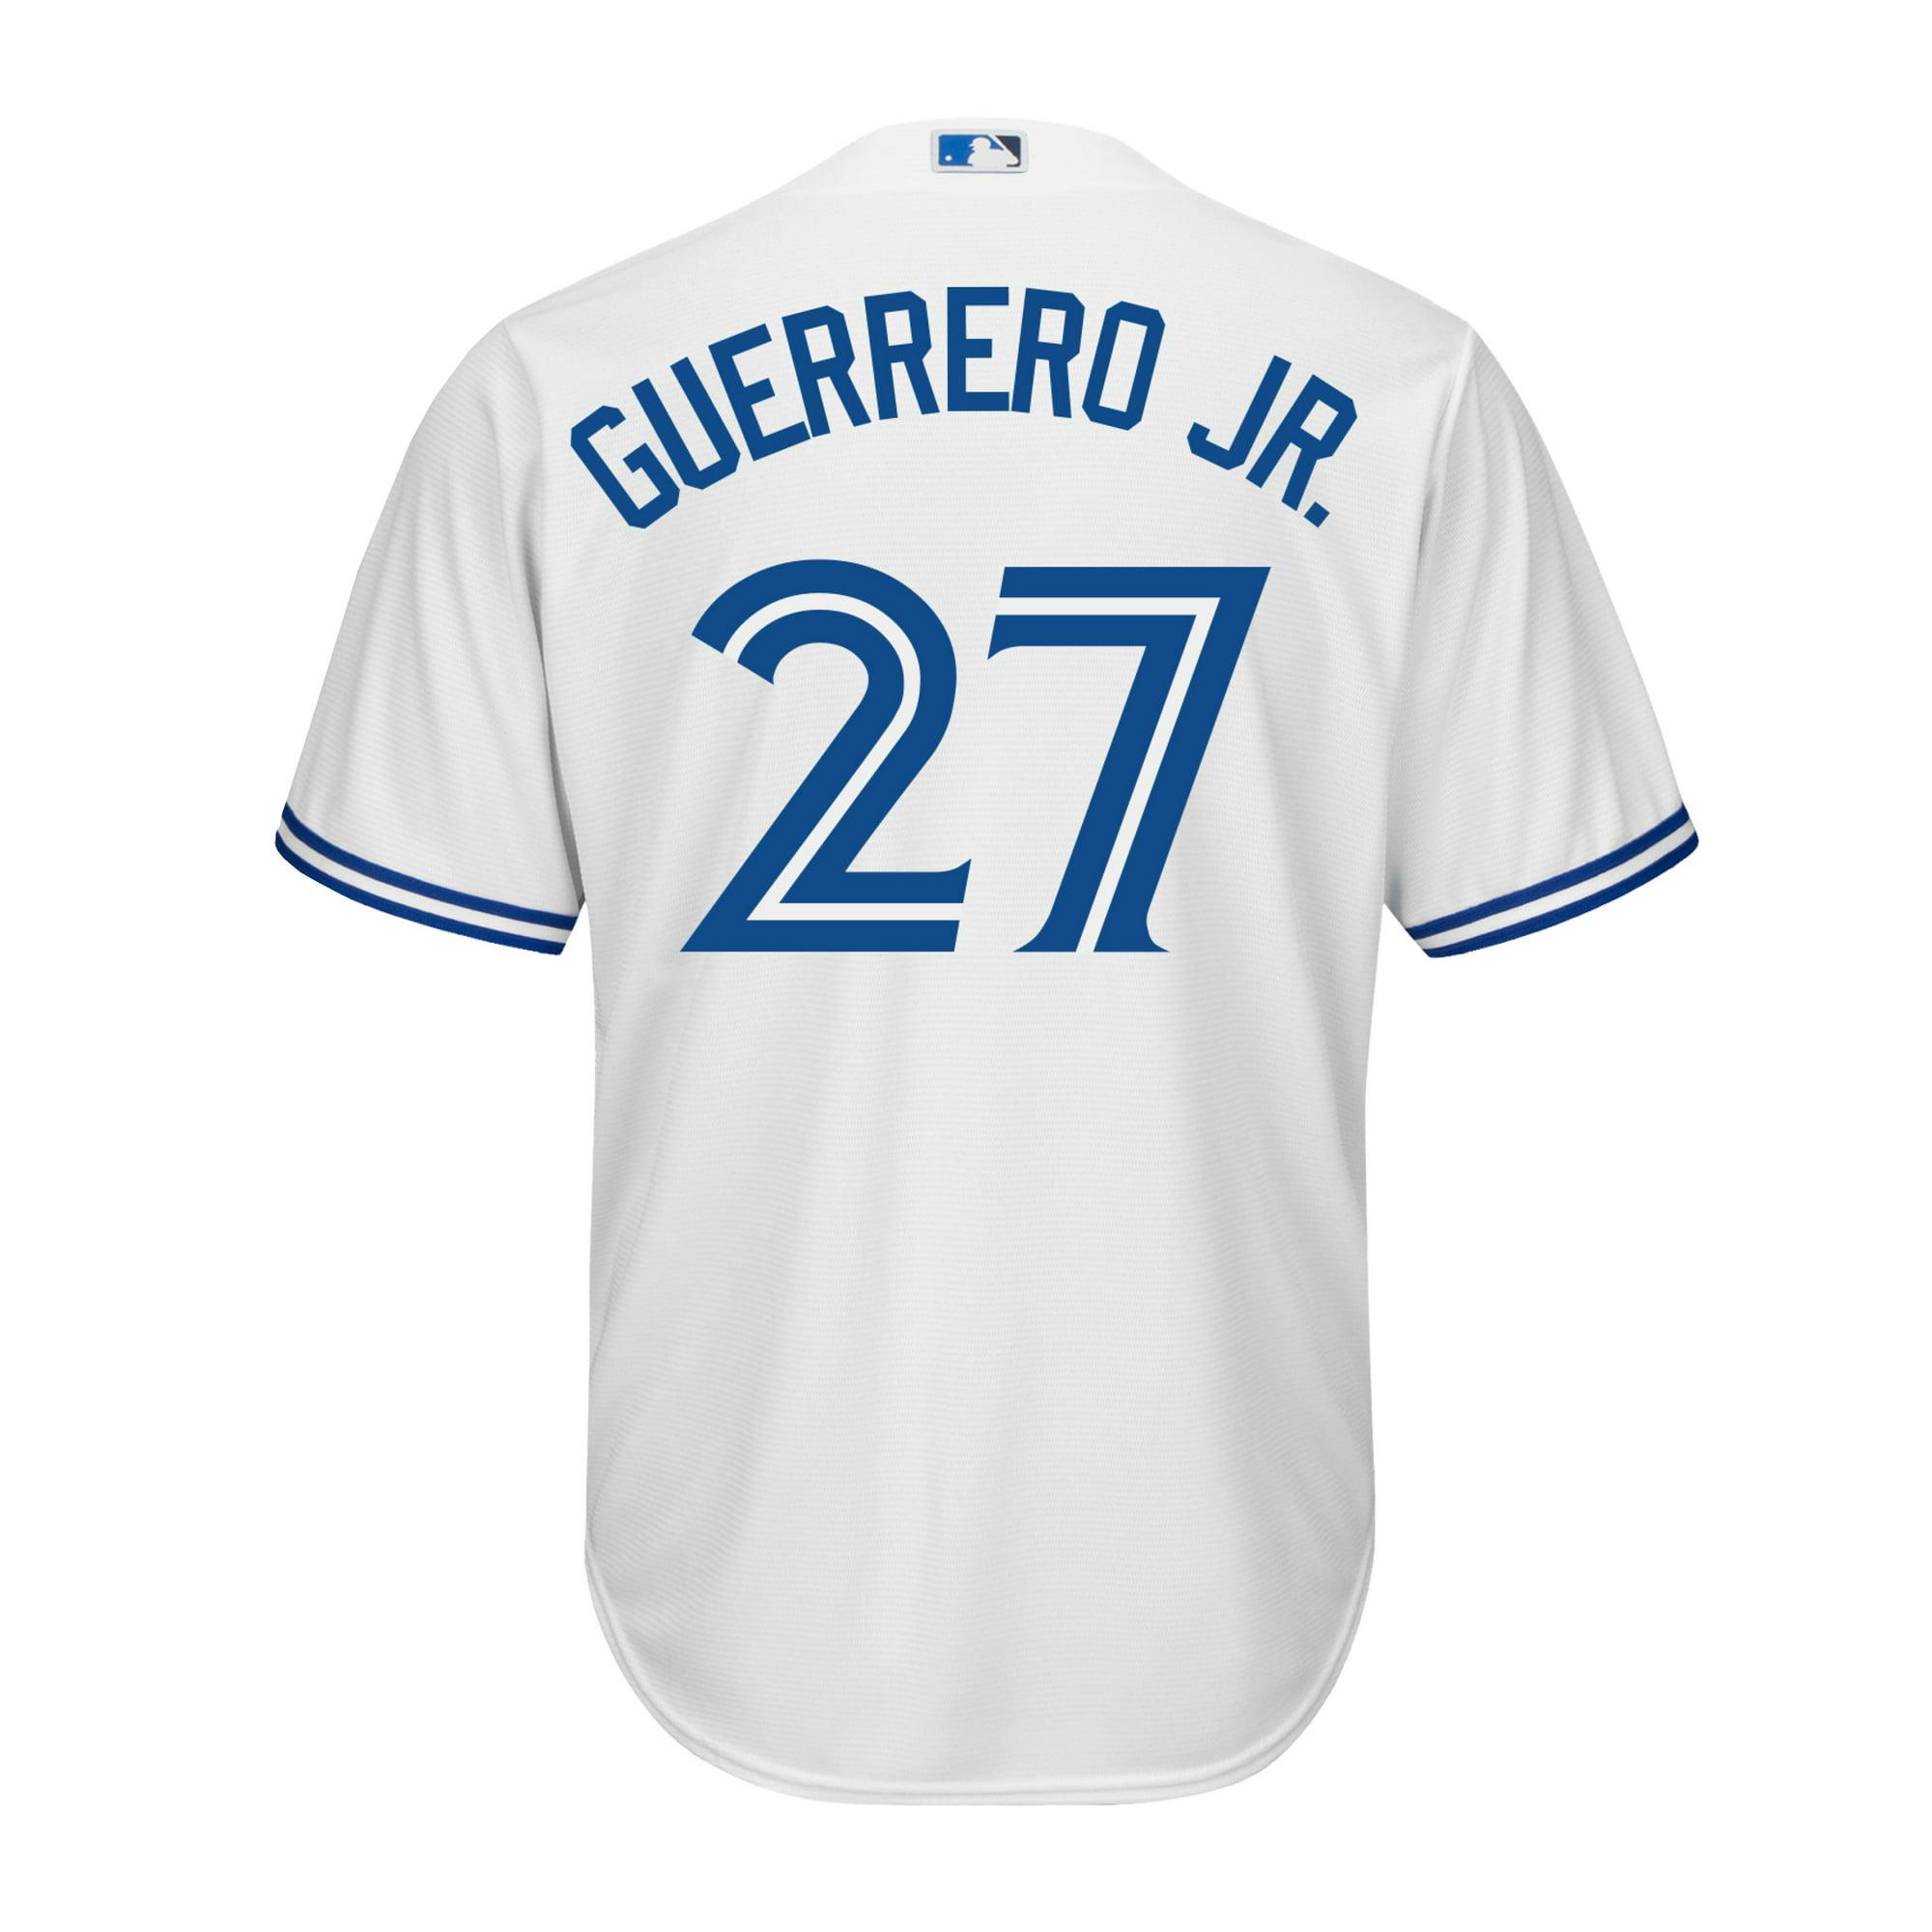 377526553 Men s Vladimir Guerrero Jr. Toronto Blue Jays MLB Cool Base Replica Home  Jersey